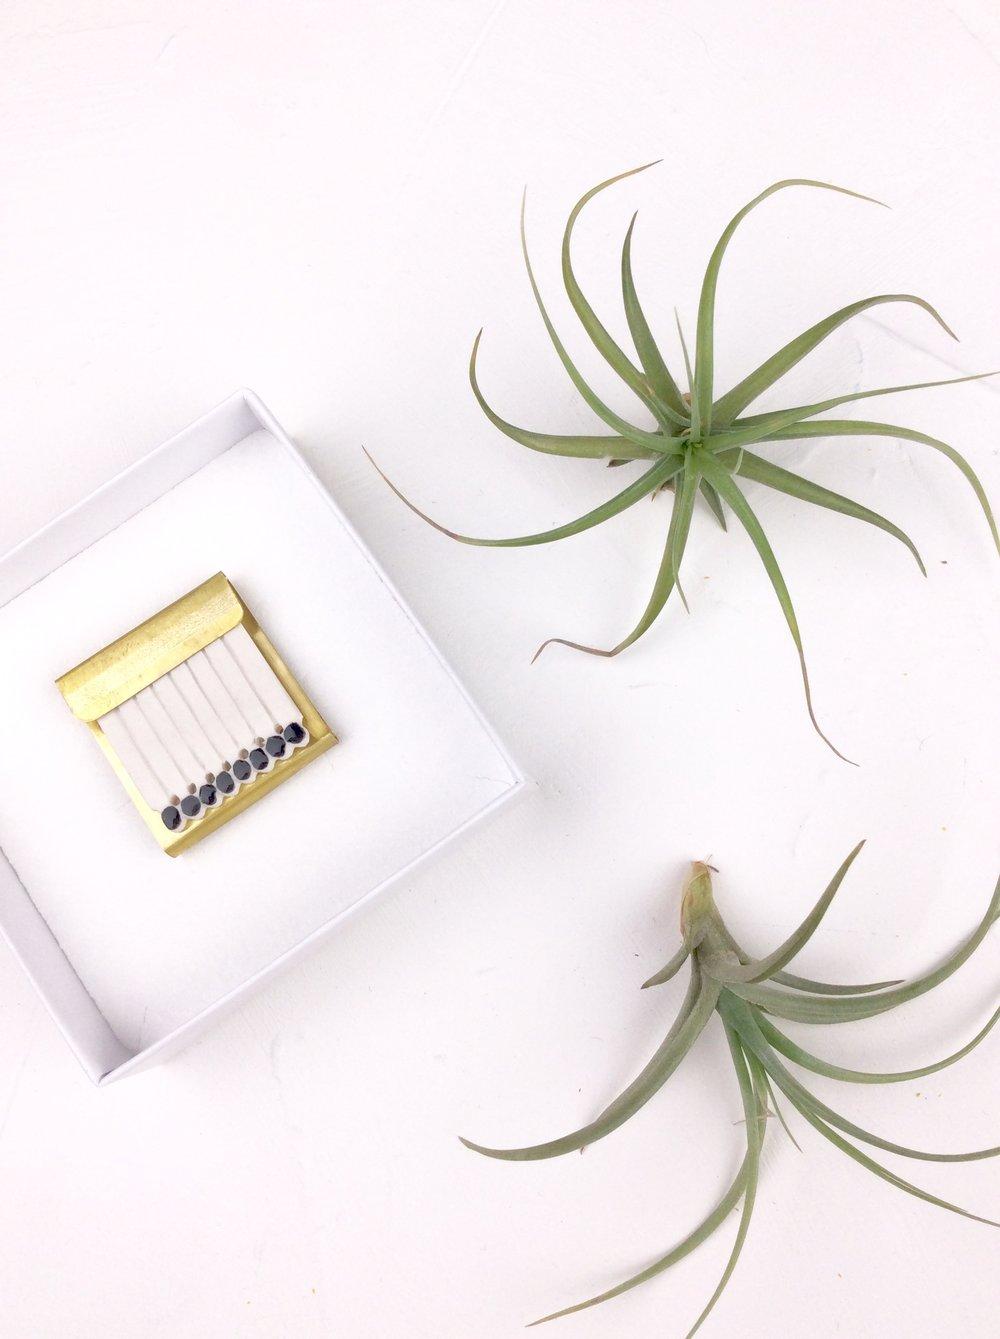 matchsticks pin made in paris france